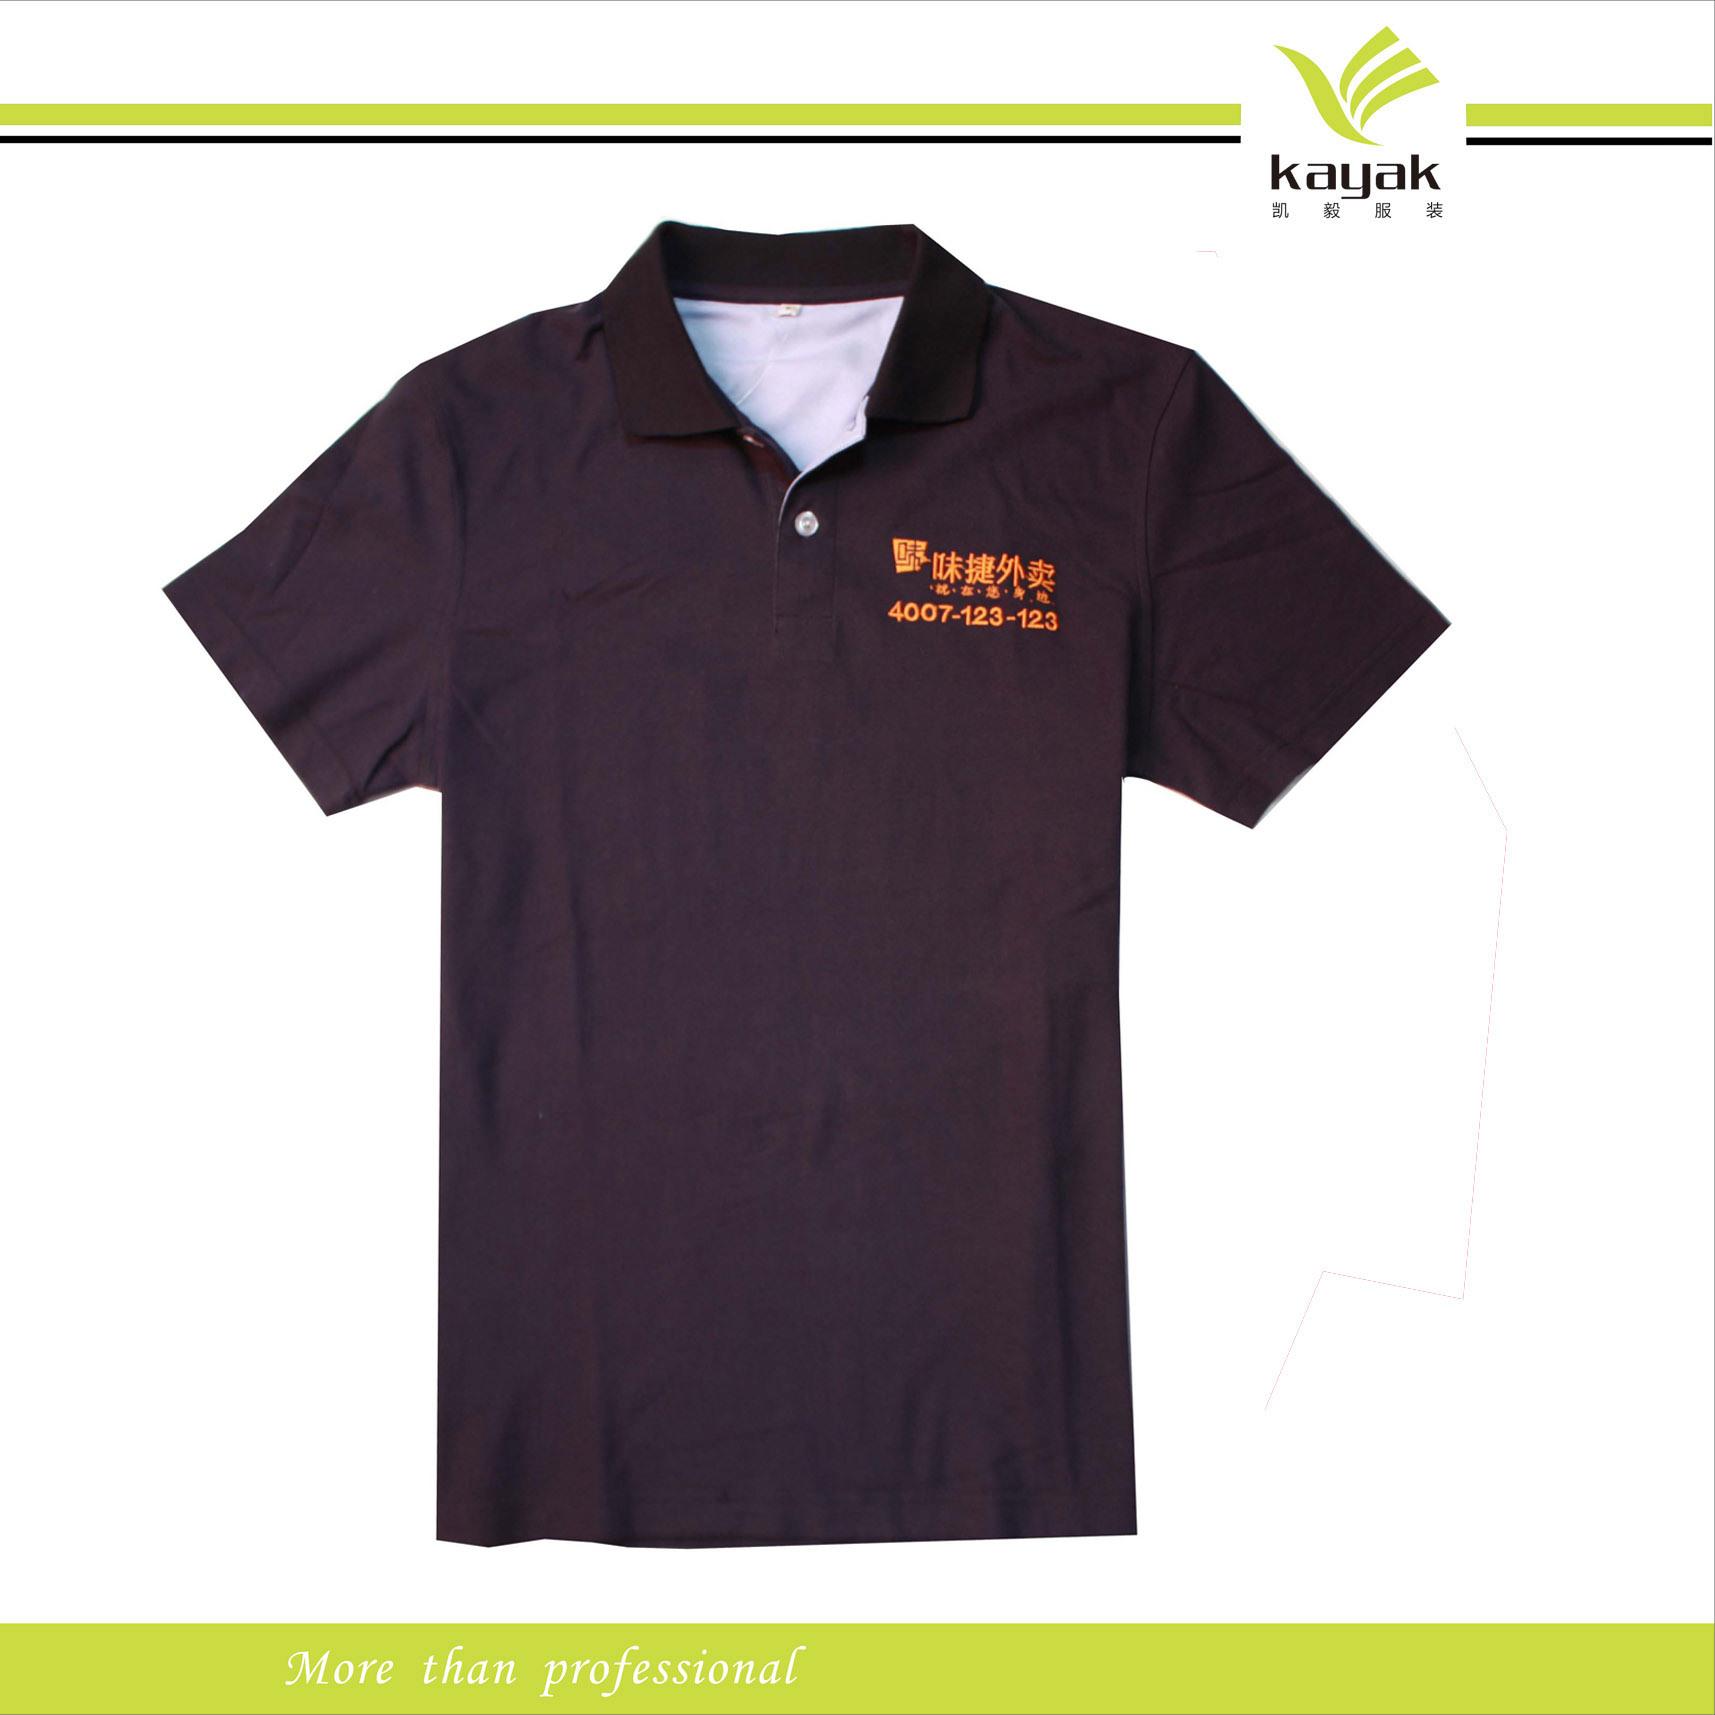 High quality custom polo shirts for High quality custom shirts